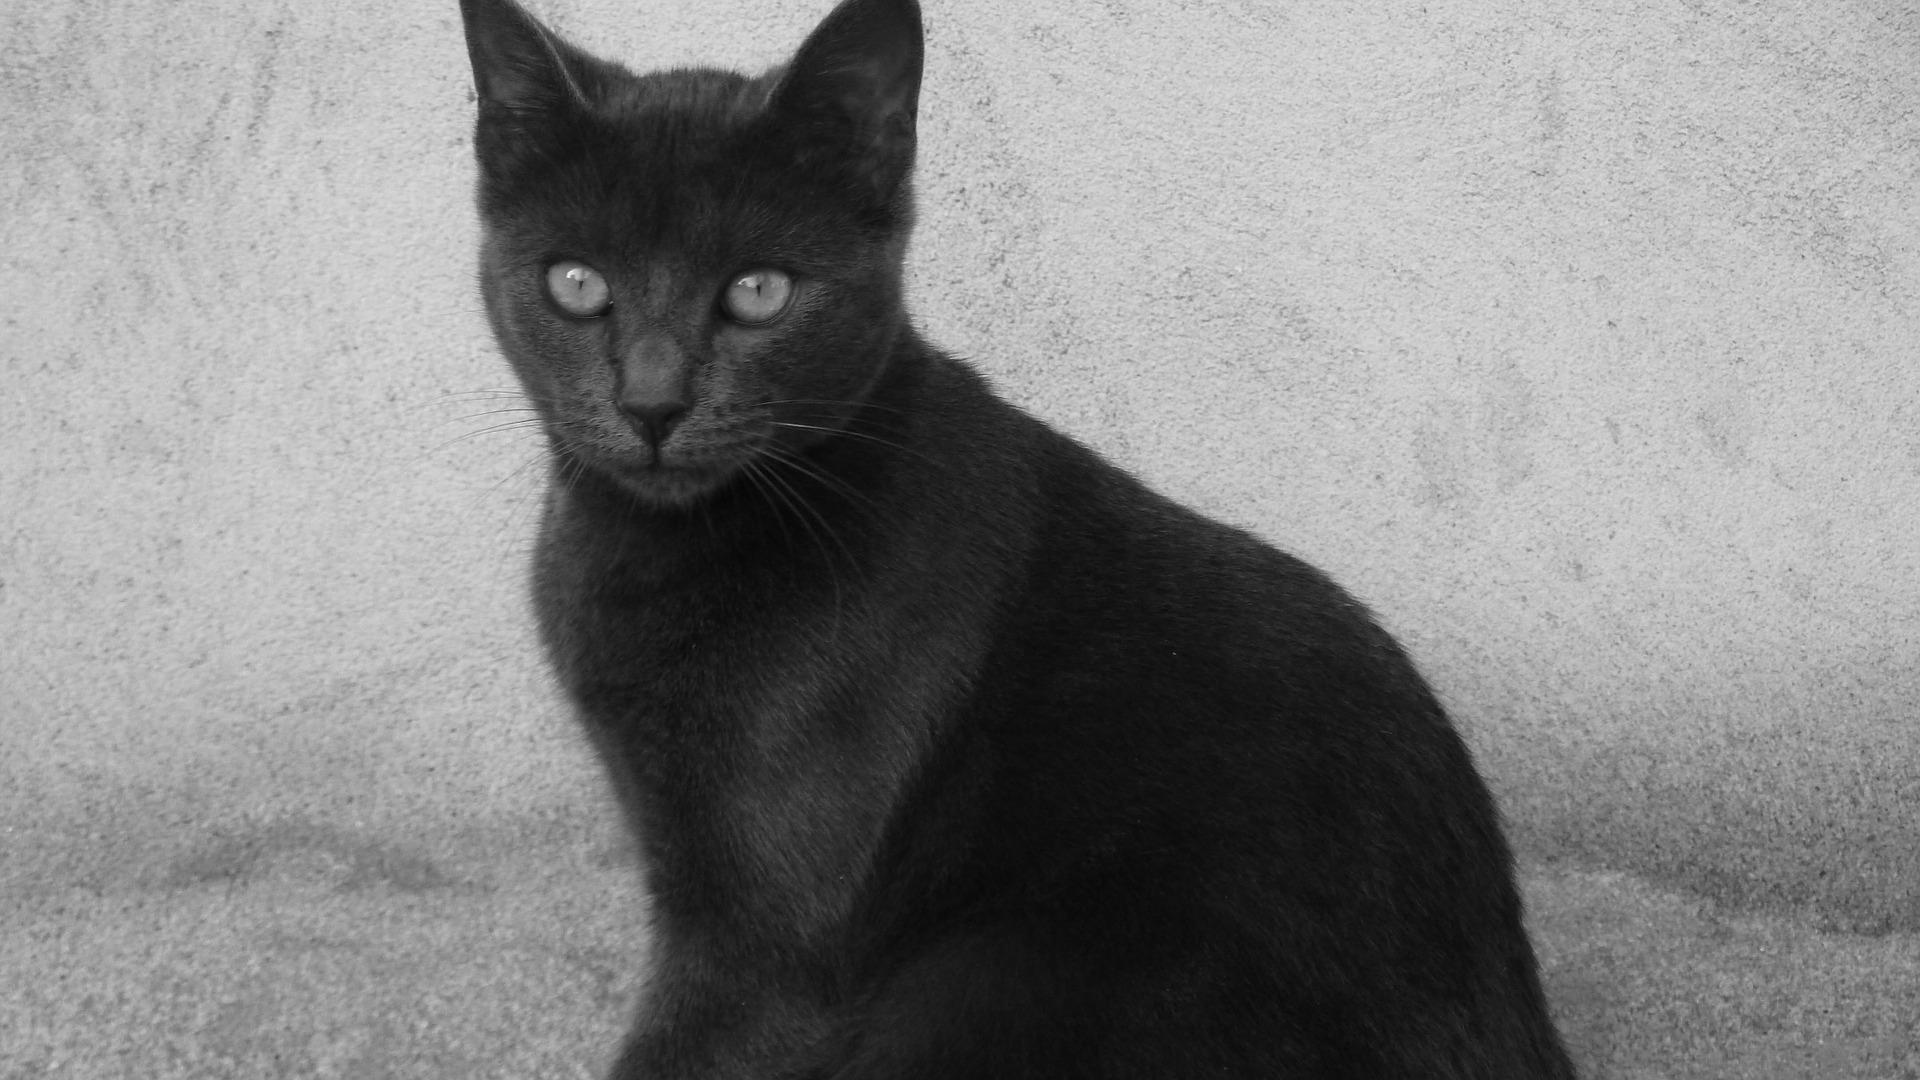 cat-173885_1920.jpg